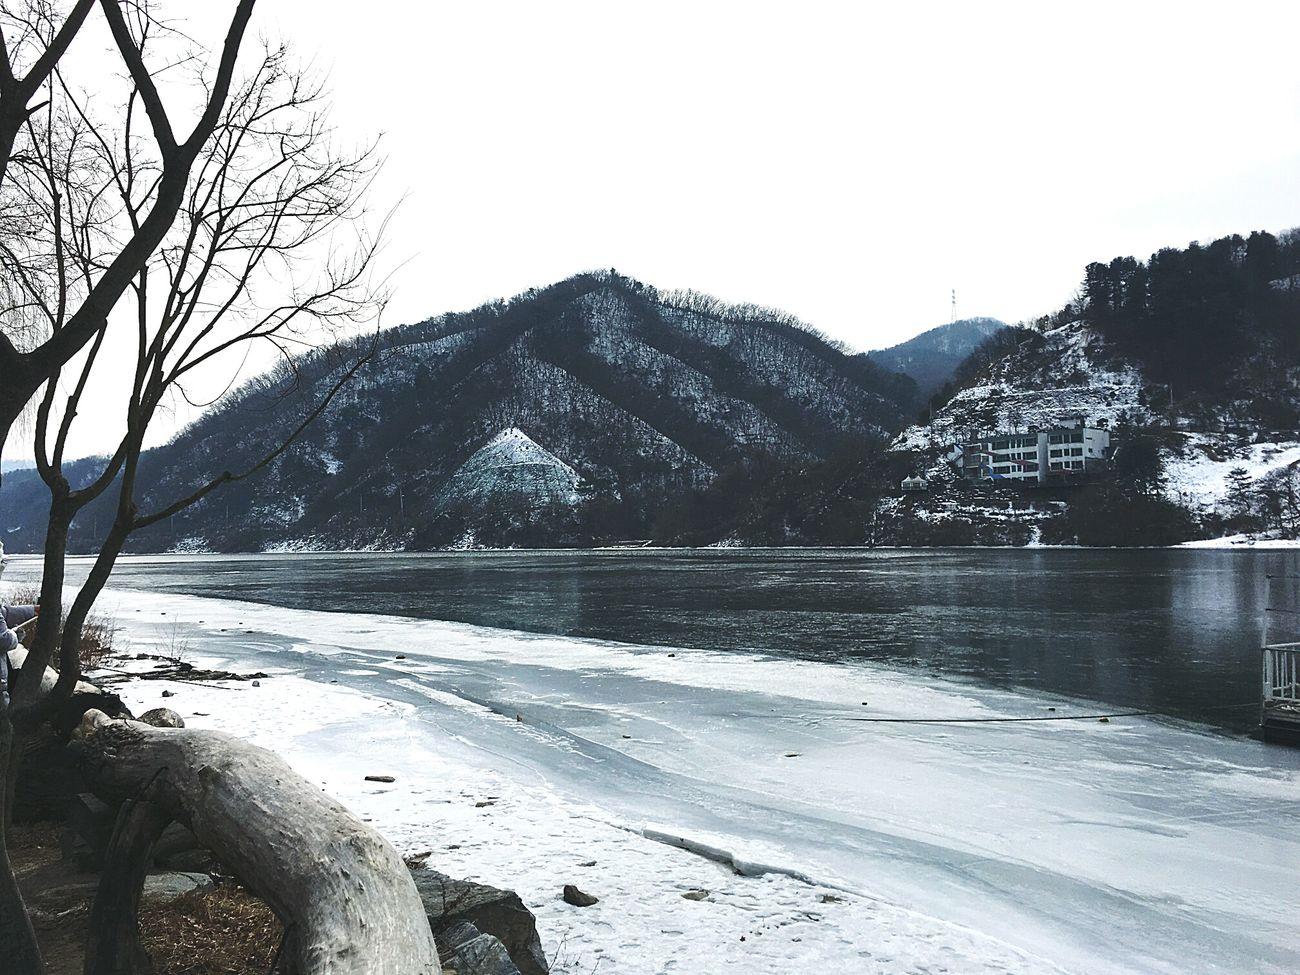 EyeEmNewHere Eyeemphotography Nature Photography South Korea Seoul Korea Nami Island Nami Island , Korea EyeEm Best Shots - Nature EyeEm Best Shots - Landscape Snow❄⛄ Snowcapped Mountain Snowflakes ❄ Snowflake Collection Asian Ethnicity Asianstyle Mobile Conversations